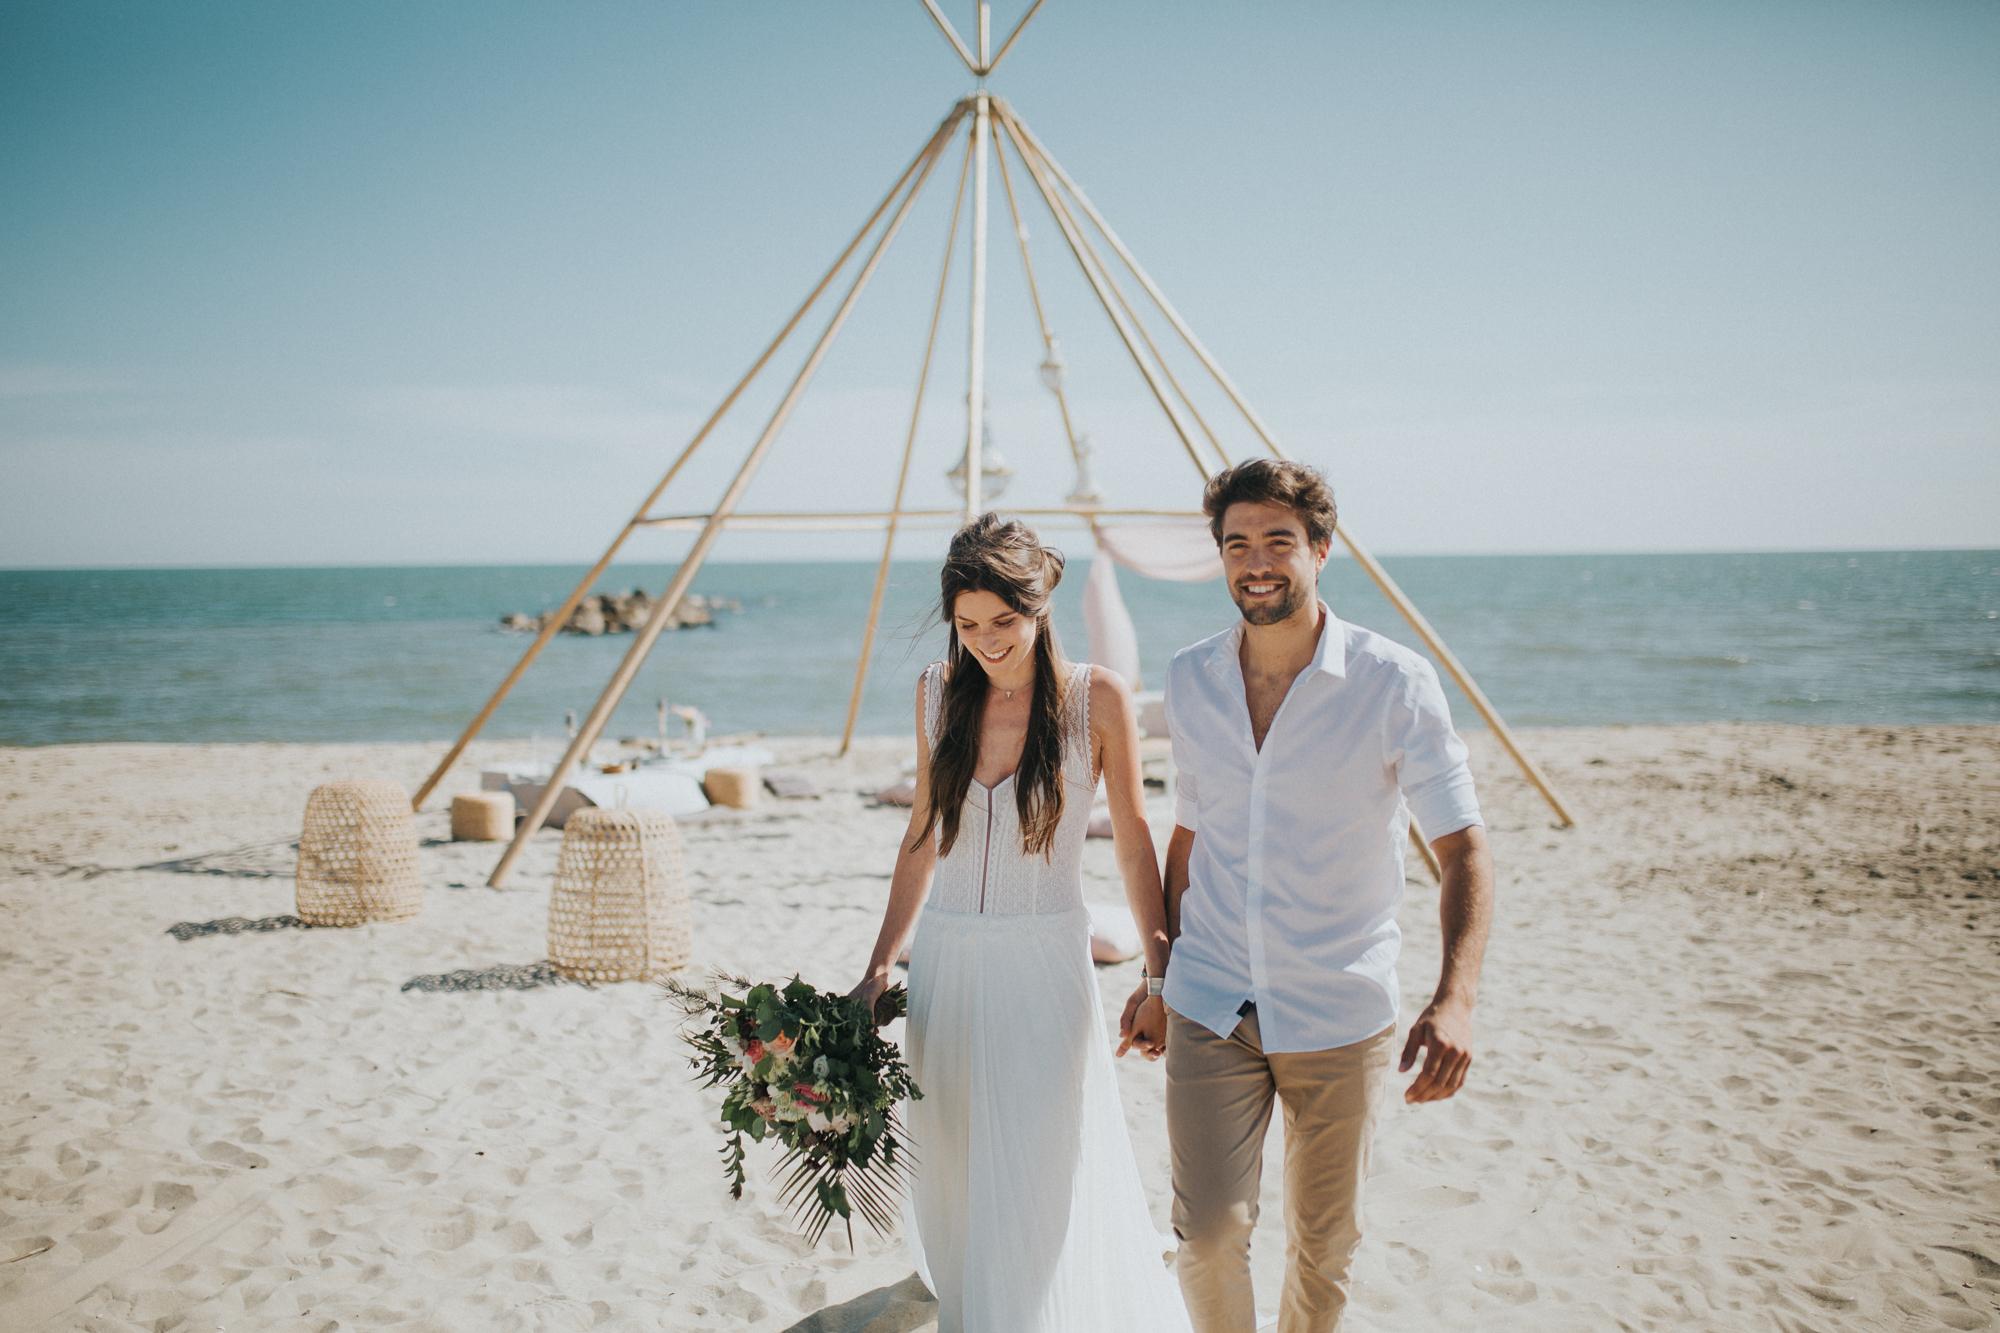 melaniebultez-folk-wedding-photographer-tipi-provence-71.jpg